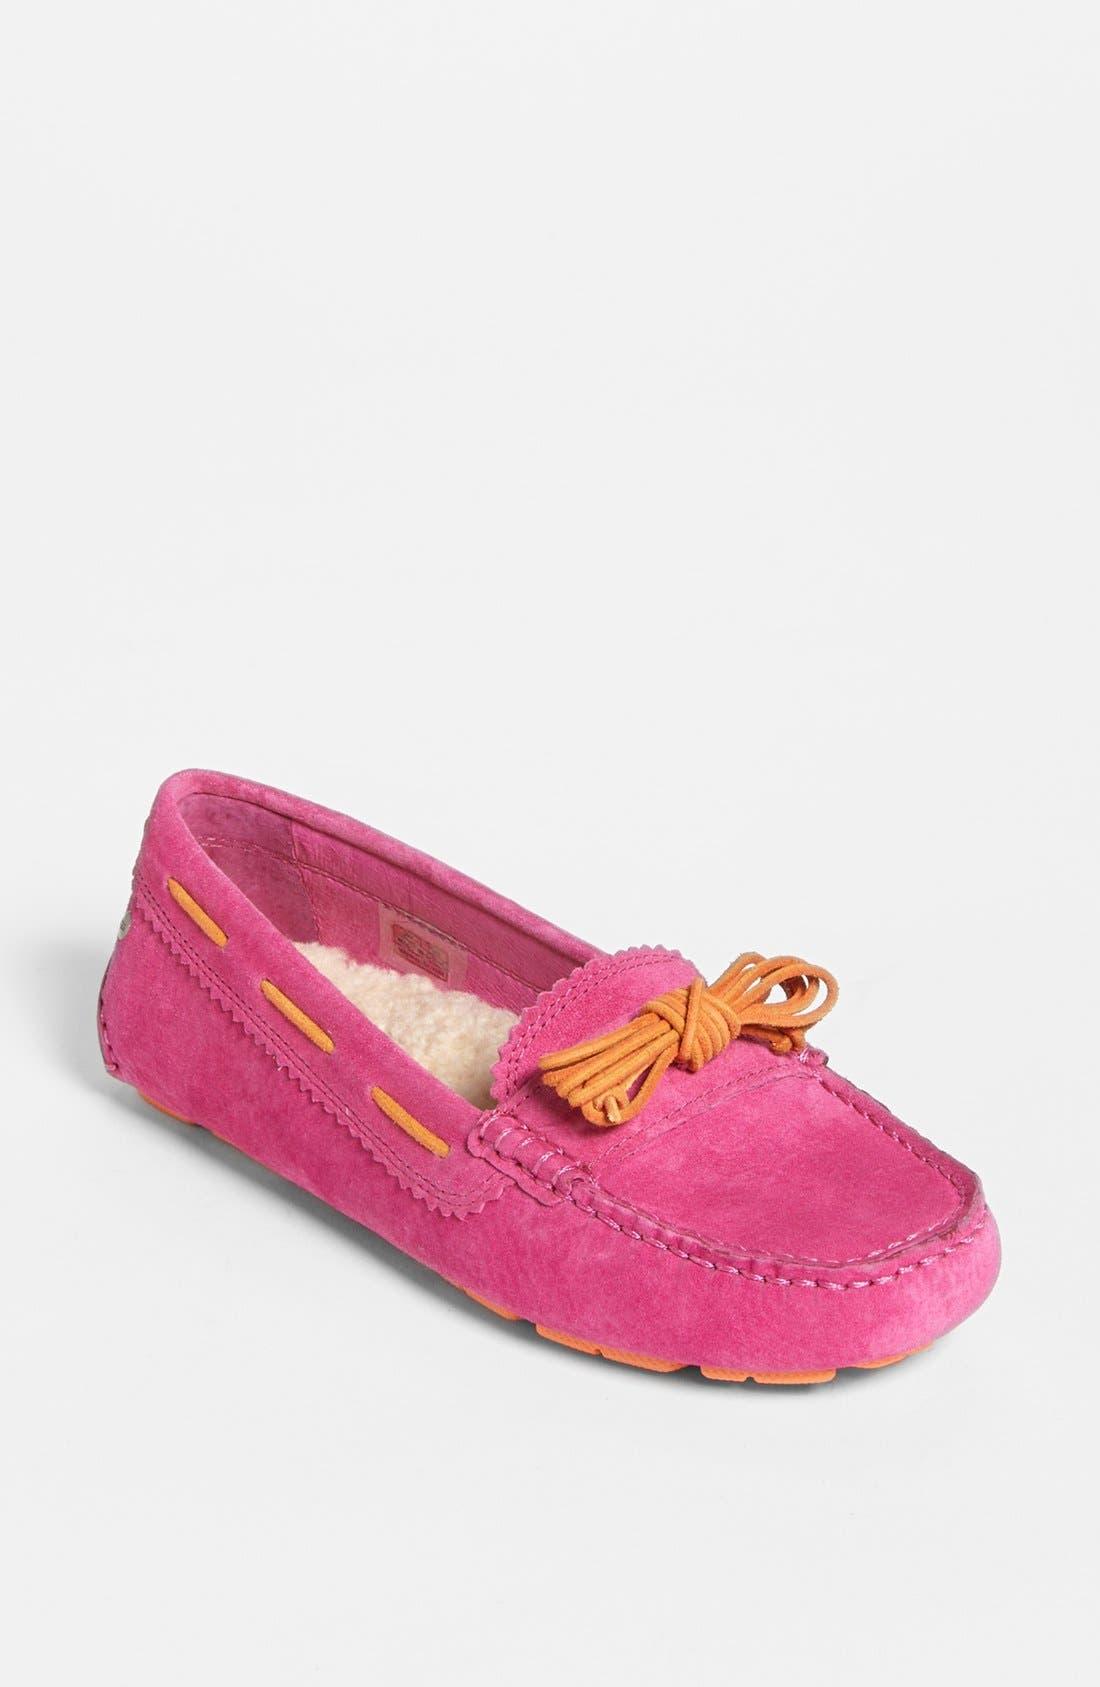 Main Image - UGG® Australia 'Meena' Slipper (Women)